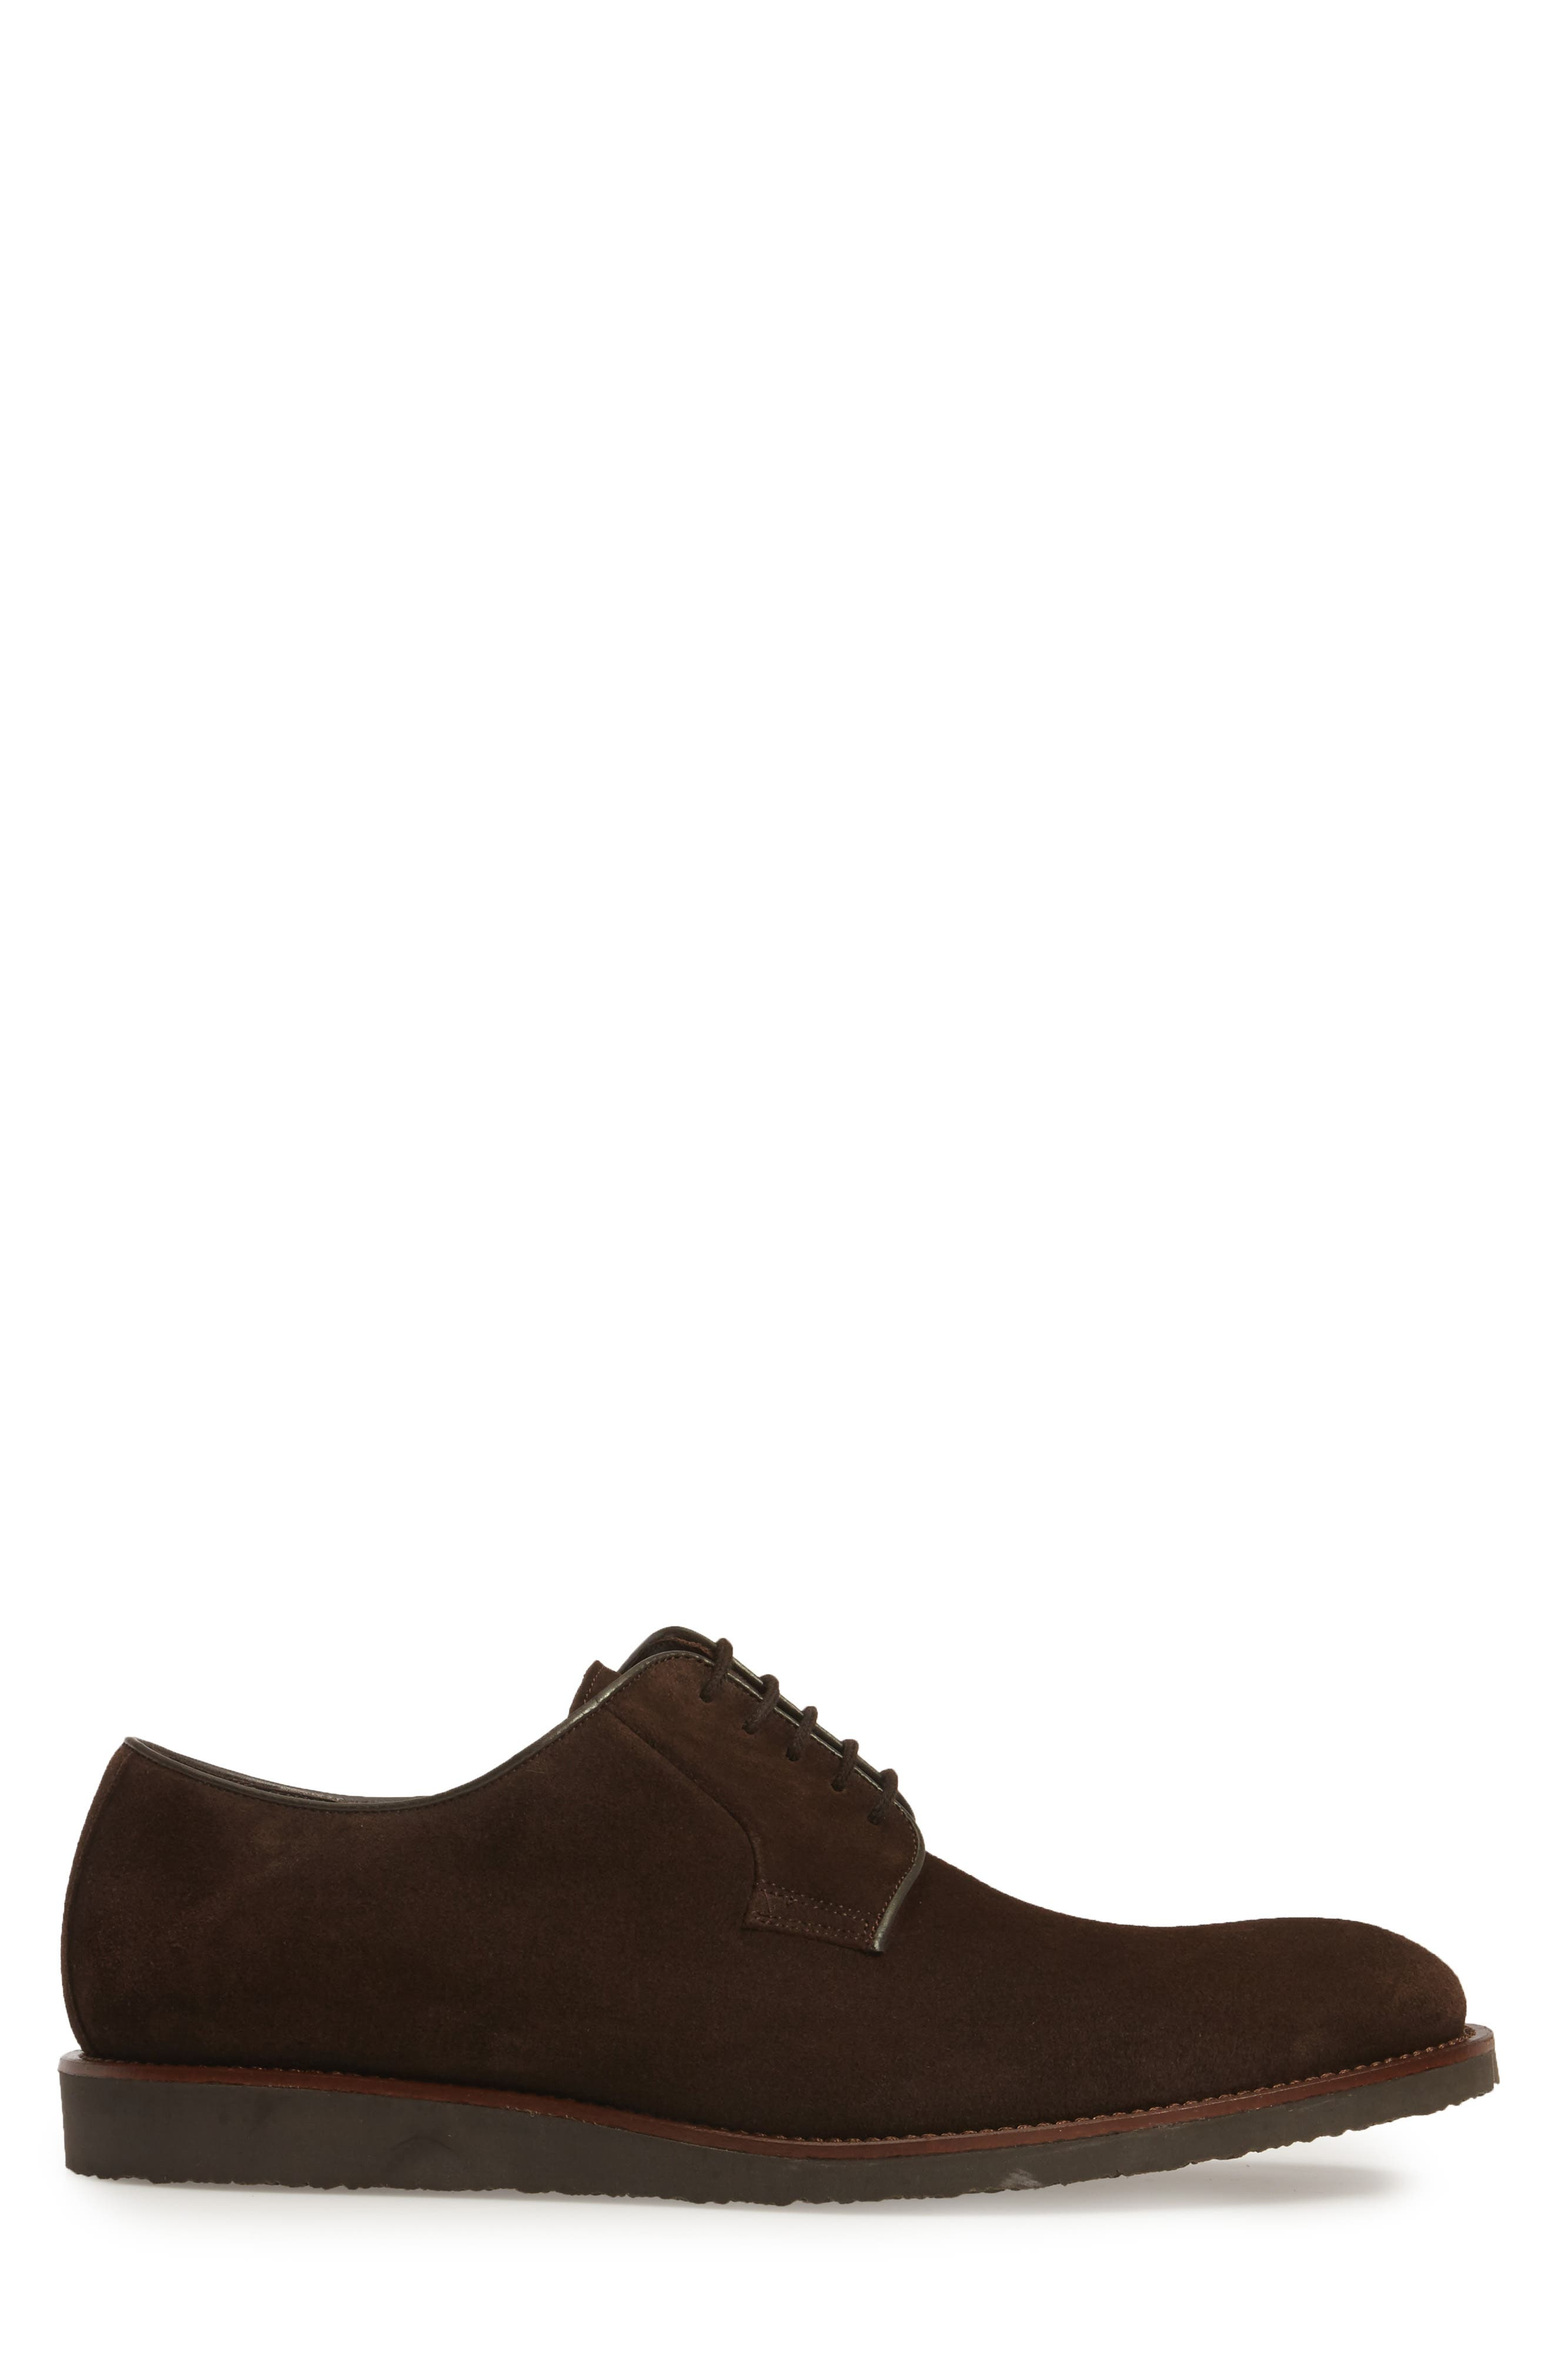 Samuel Plain-Toe Derby,                             Alternate thumbnail 3, color,                             Brown Suede Leather